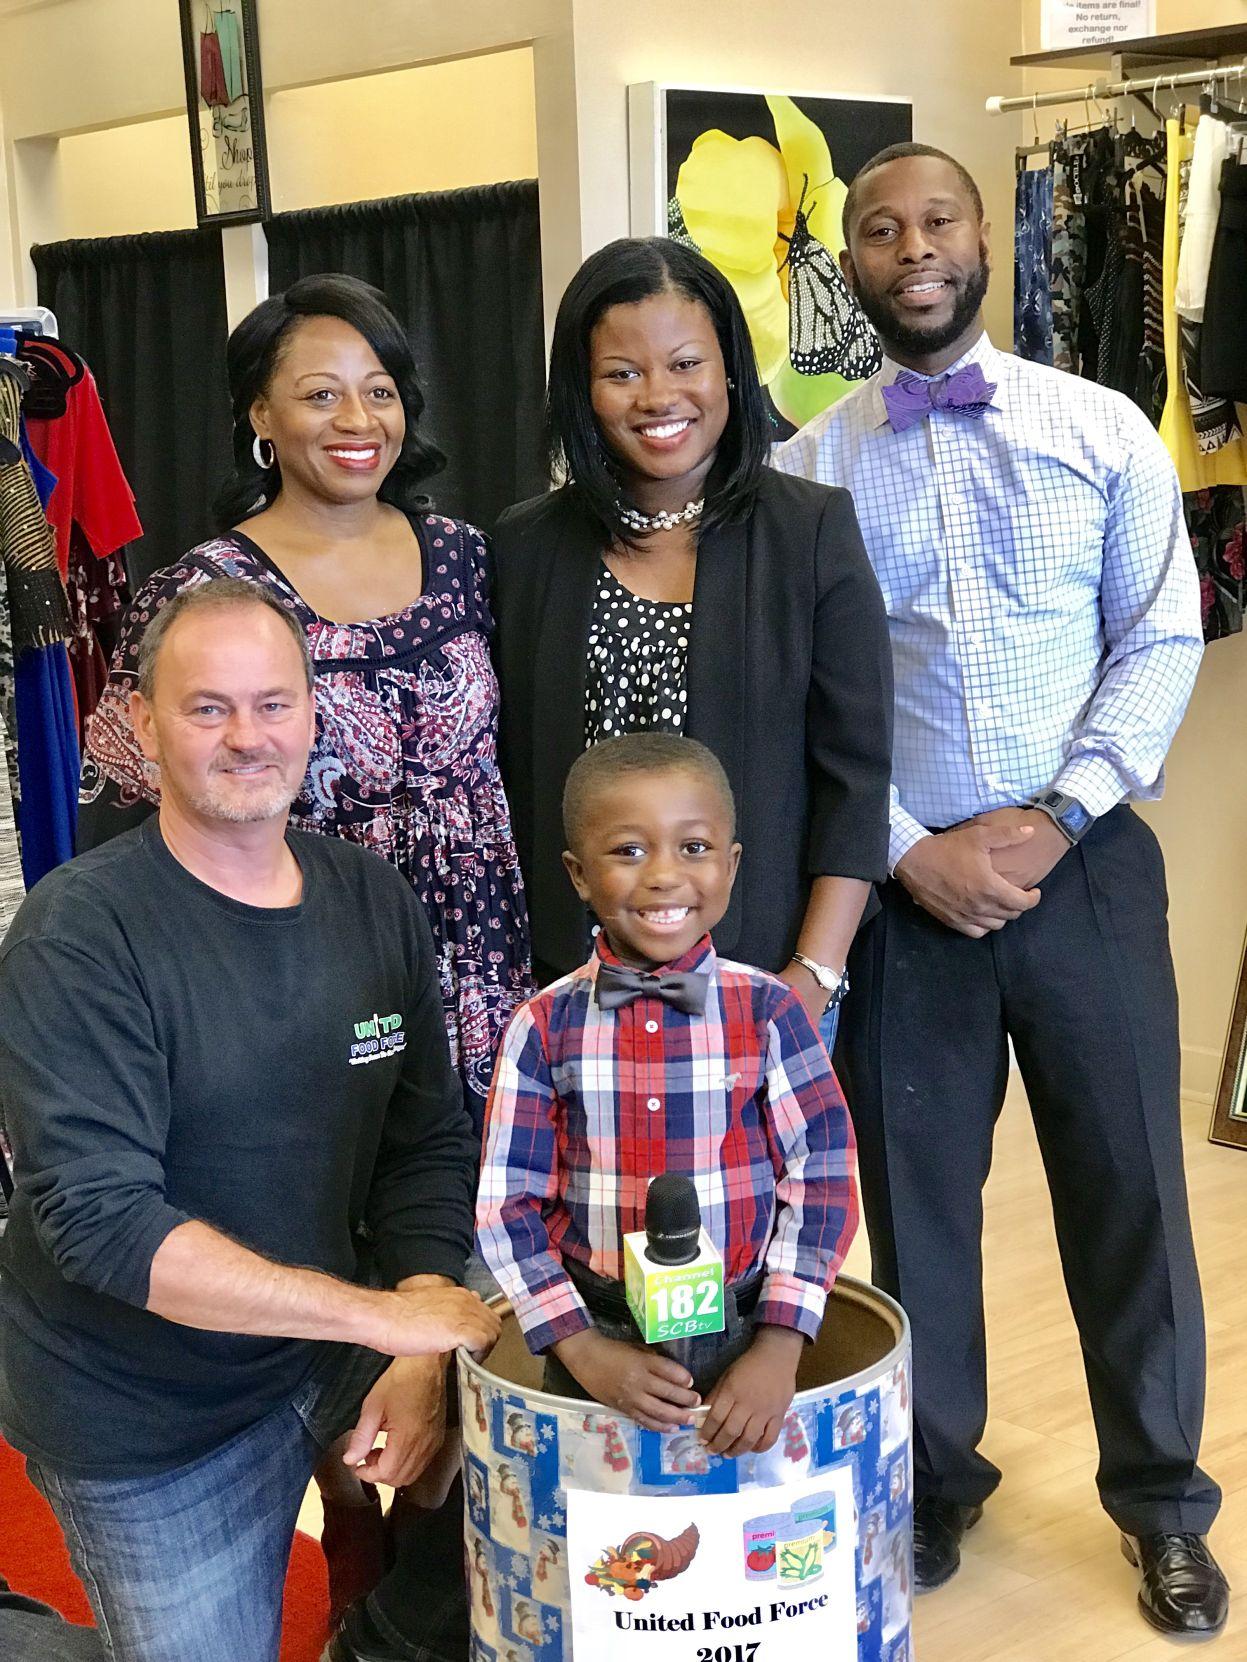 Vance McCutcheon, Sonji Monroe and Thornton family